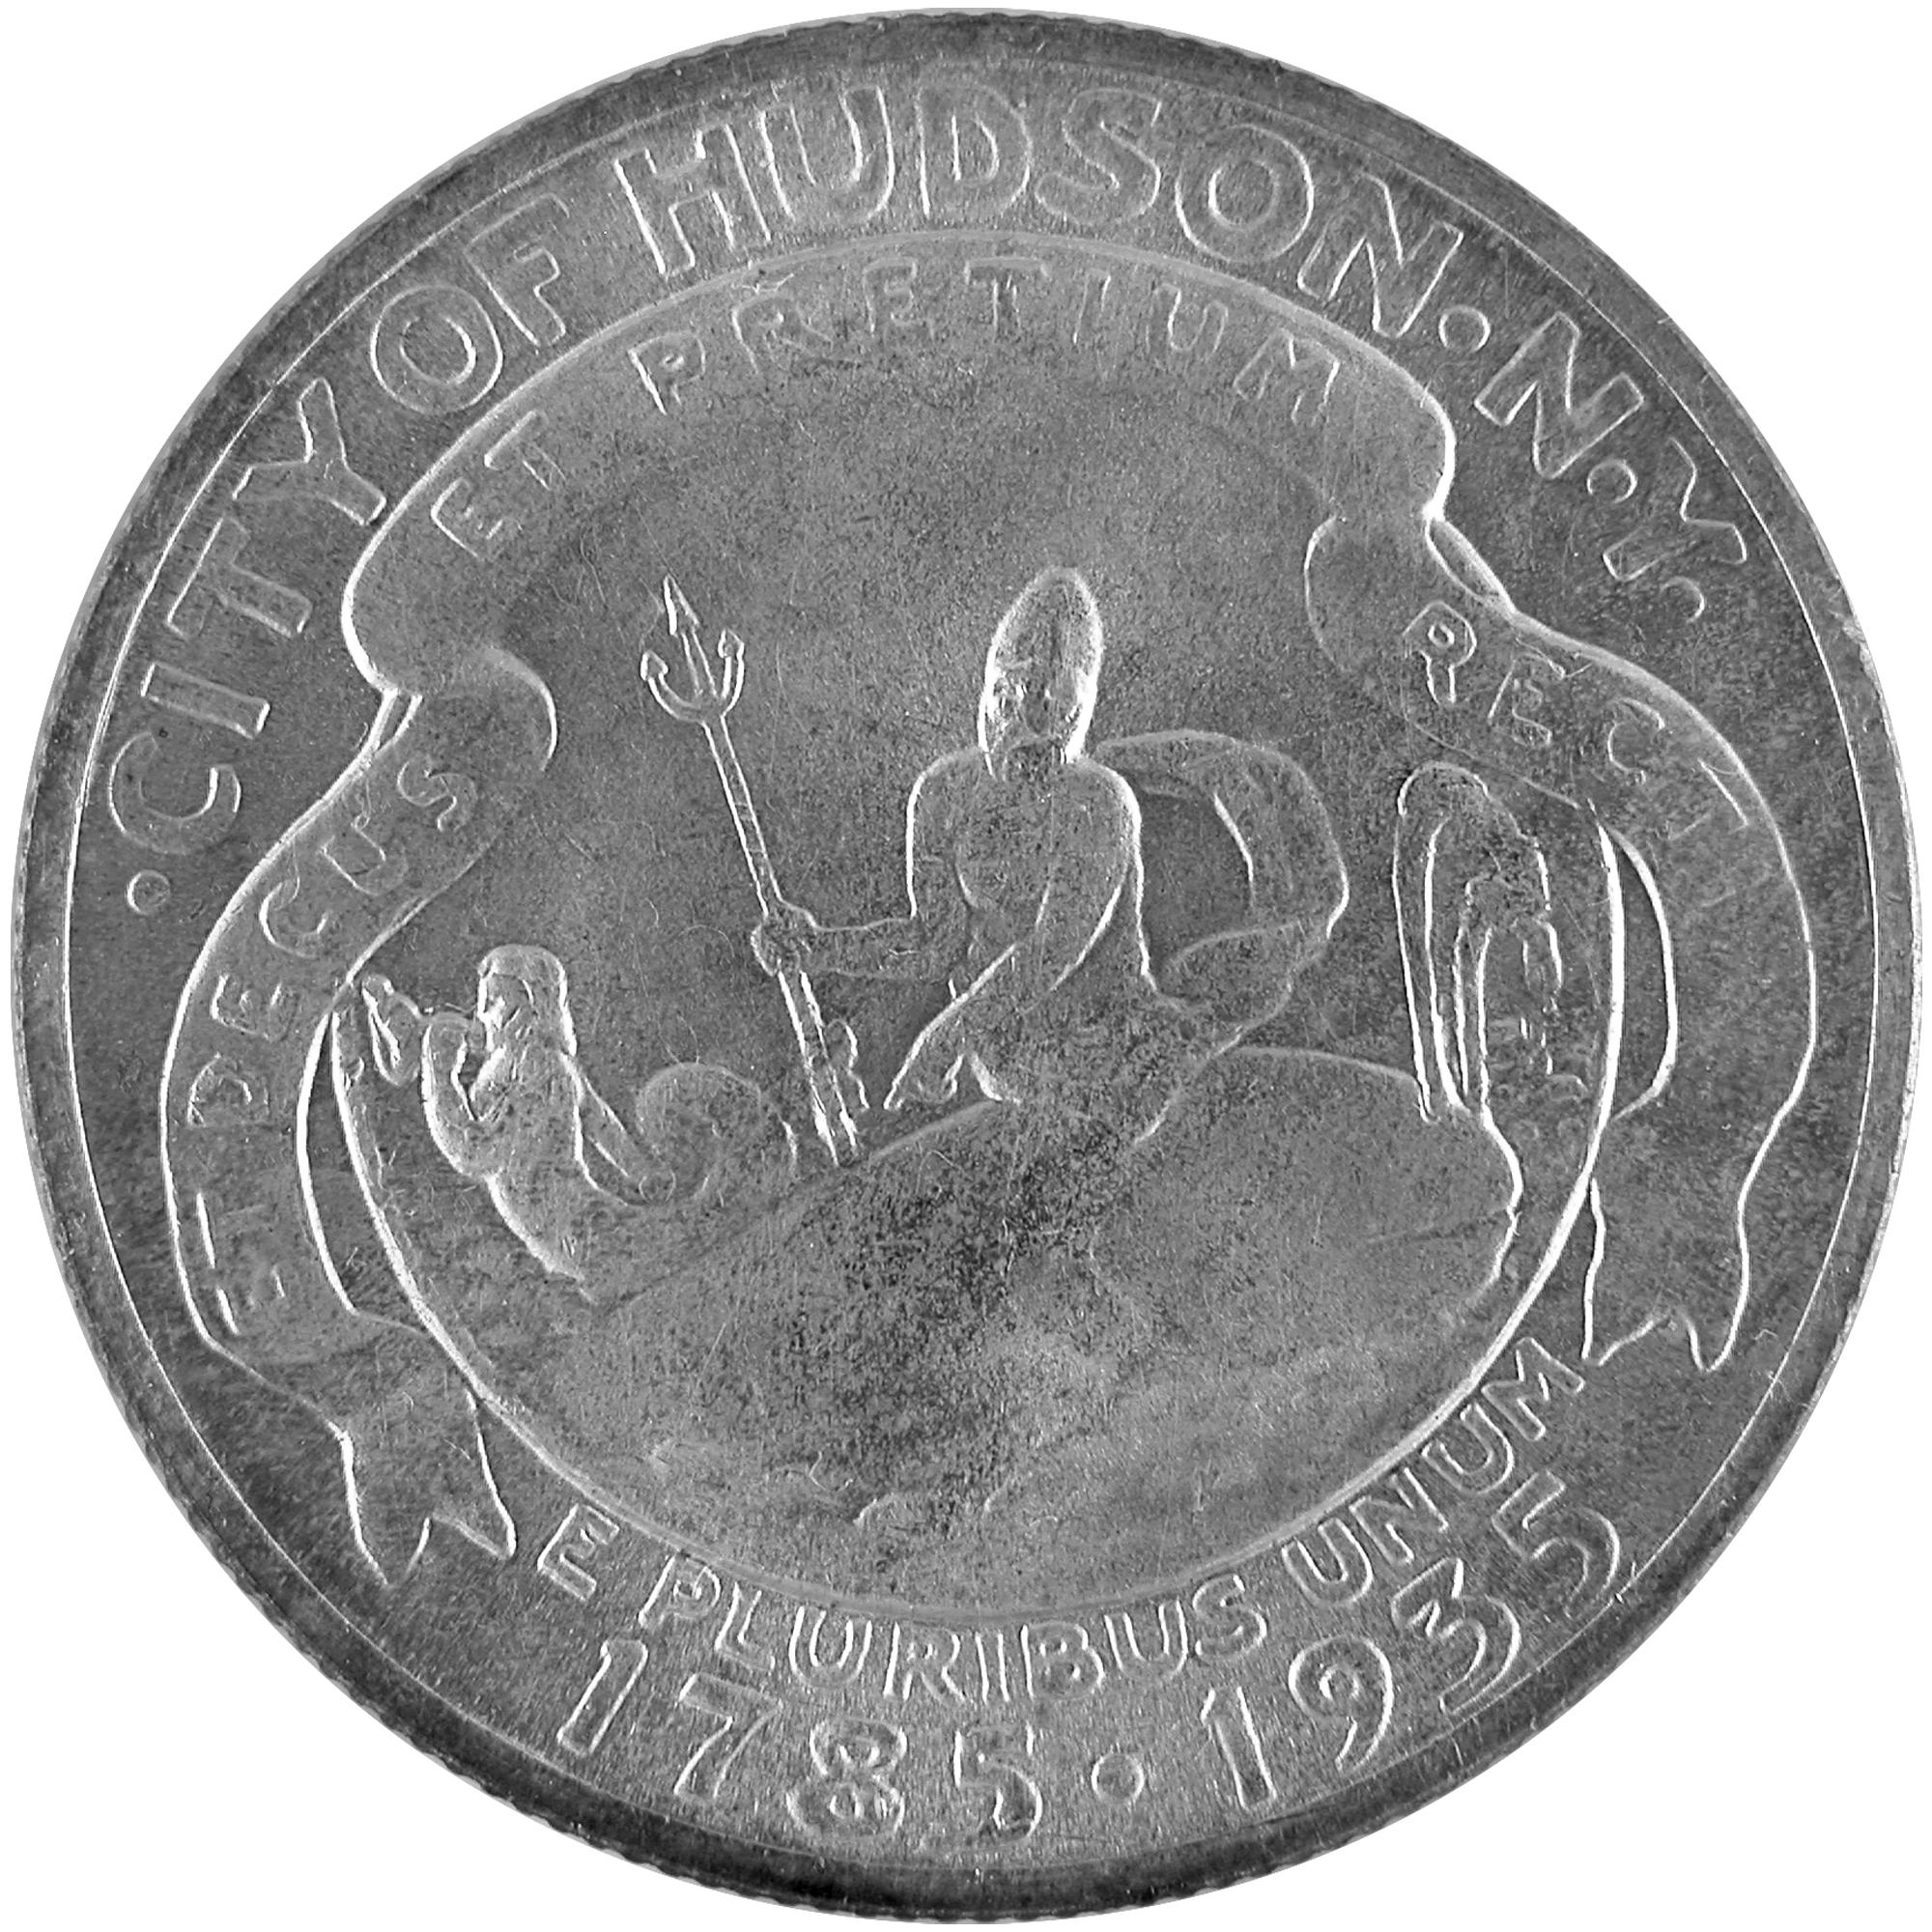 1935 Hudson New York Sesquicentennial Commemorative Silver Half Dollar Coin Obverse